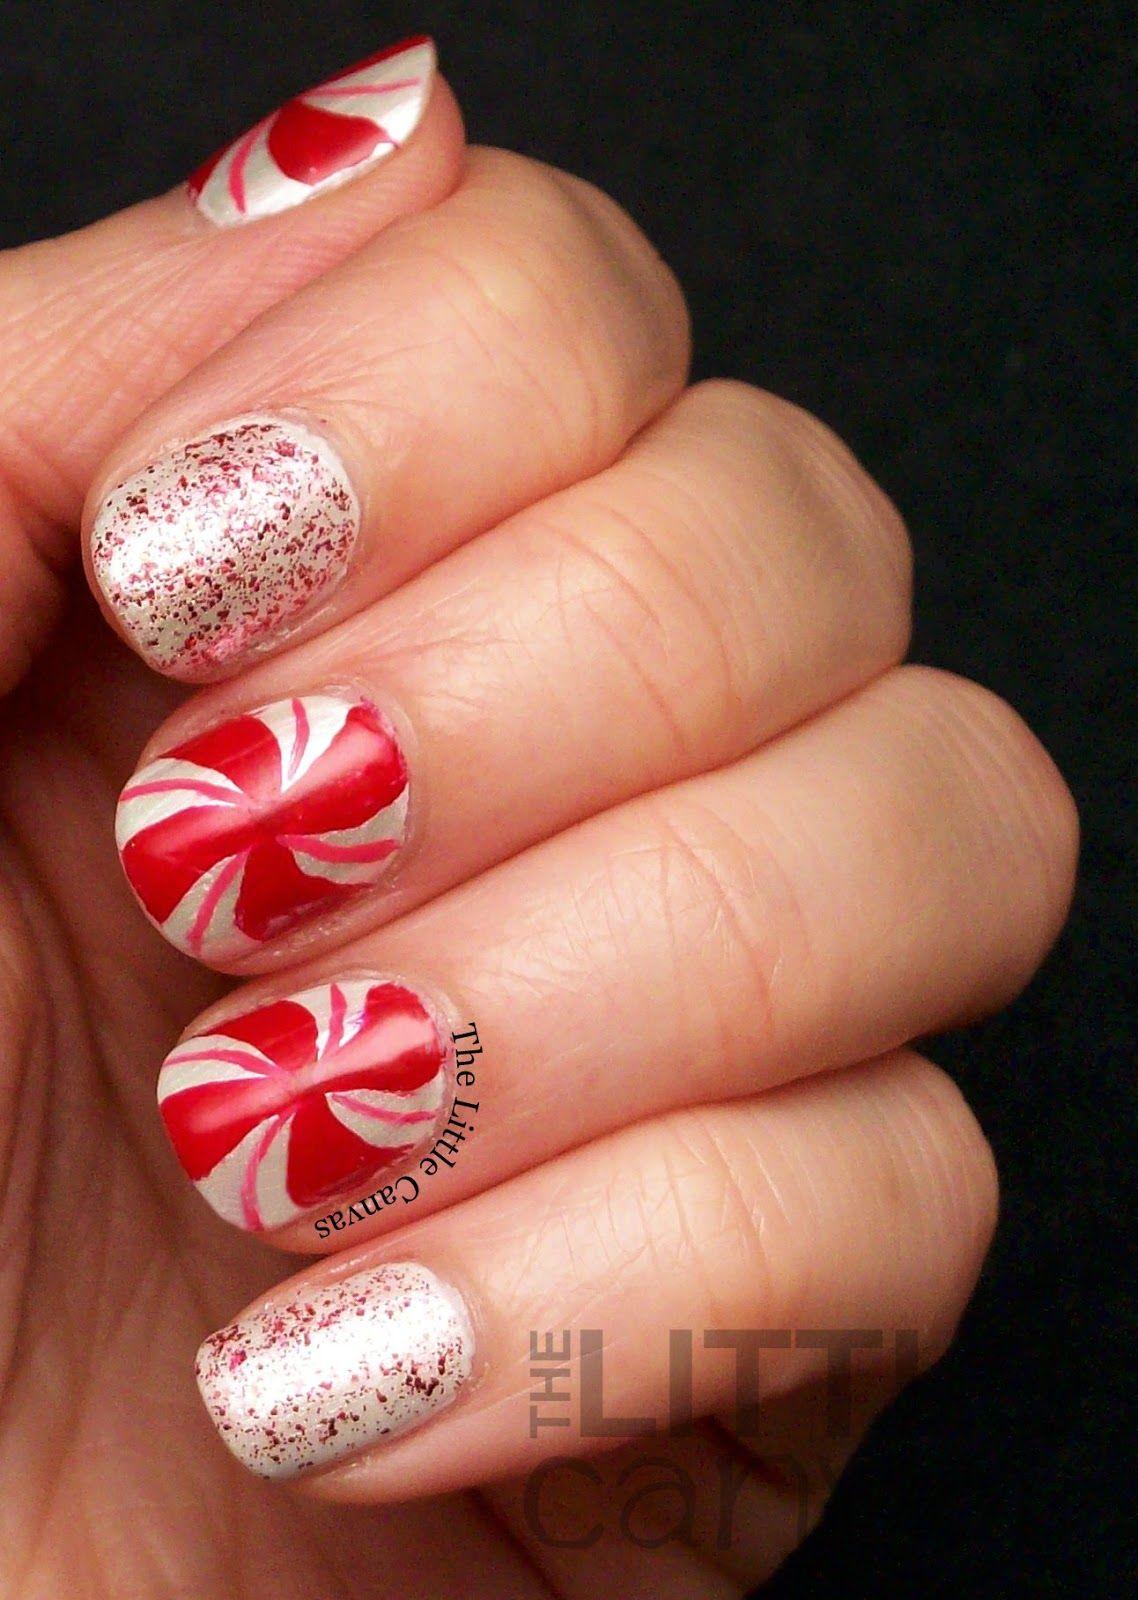 The Little Canvas Peppermint Candy Nail Art Nails Pinterest